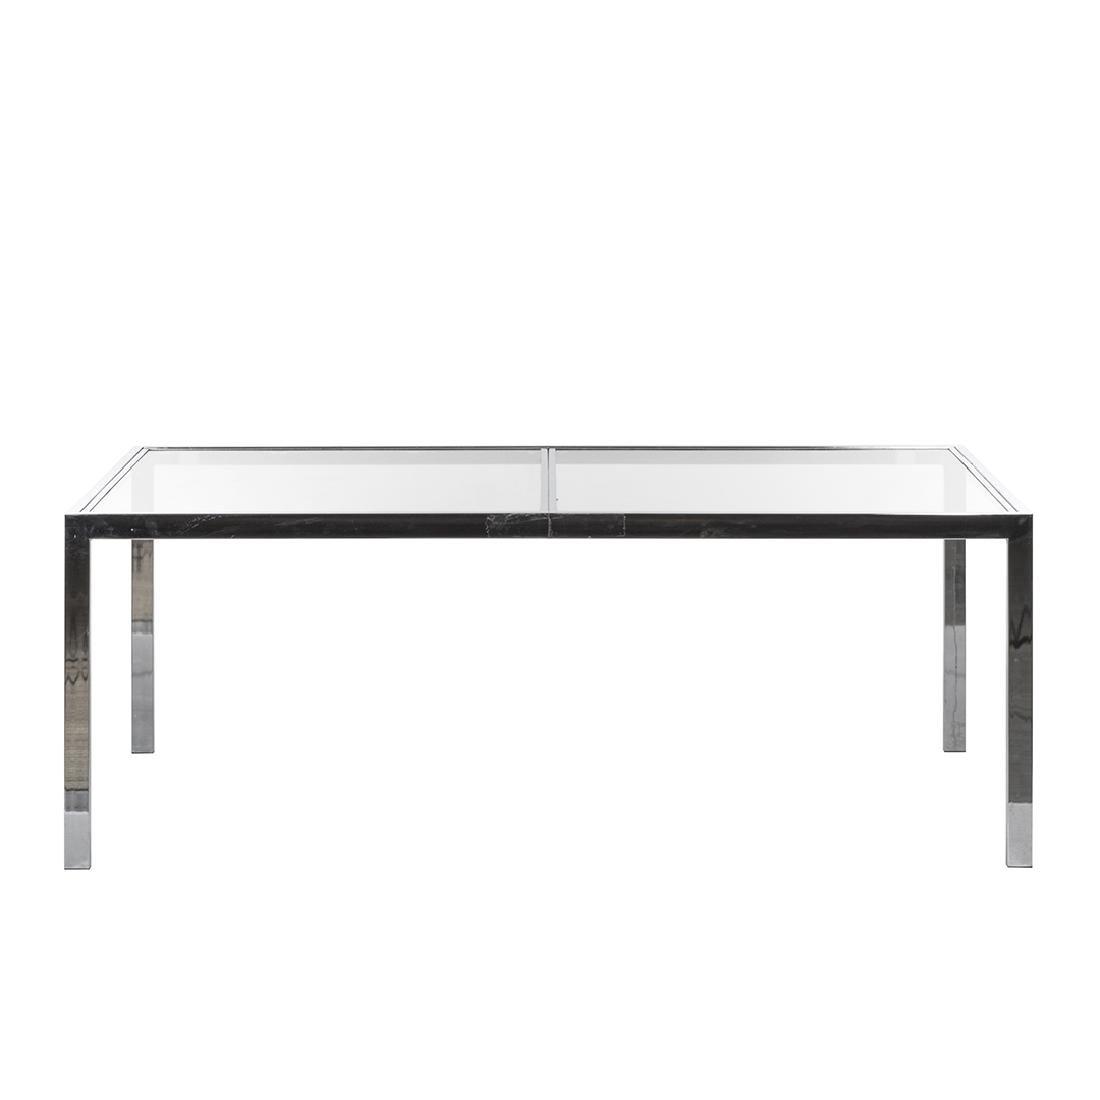 Milo Baughman Chrome and Glass Dining Table